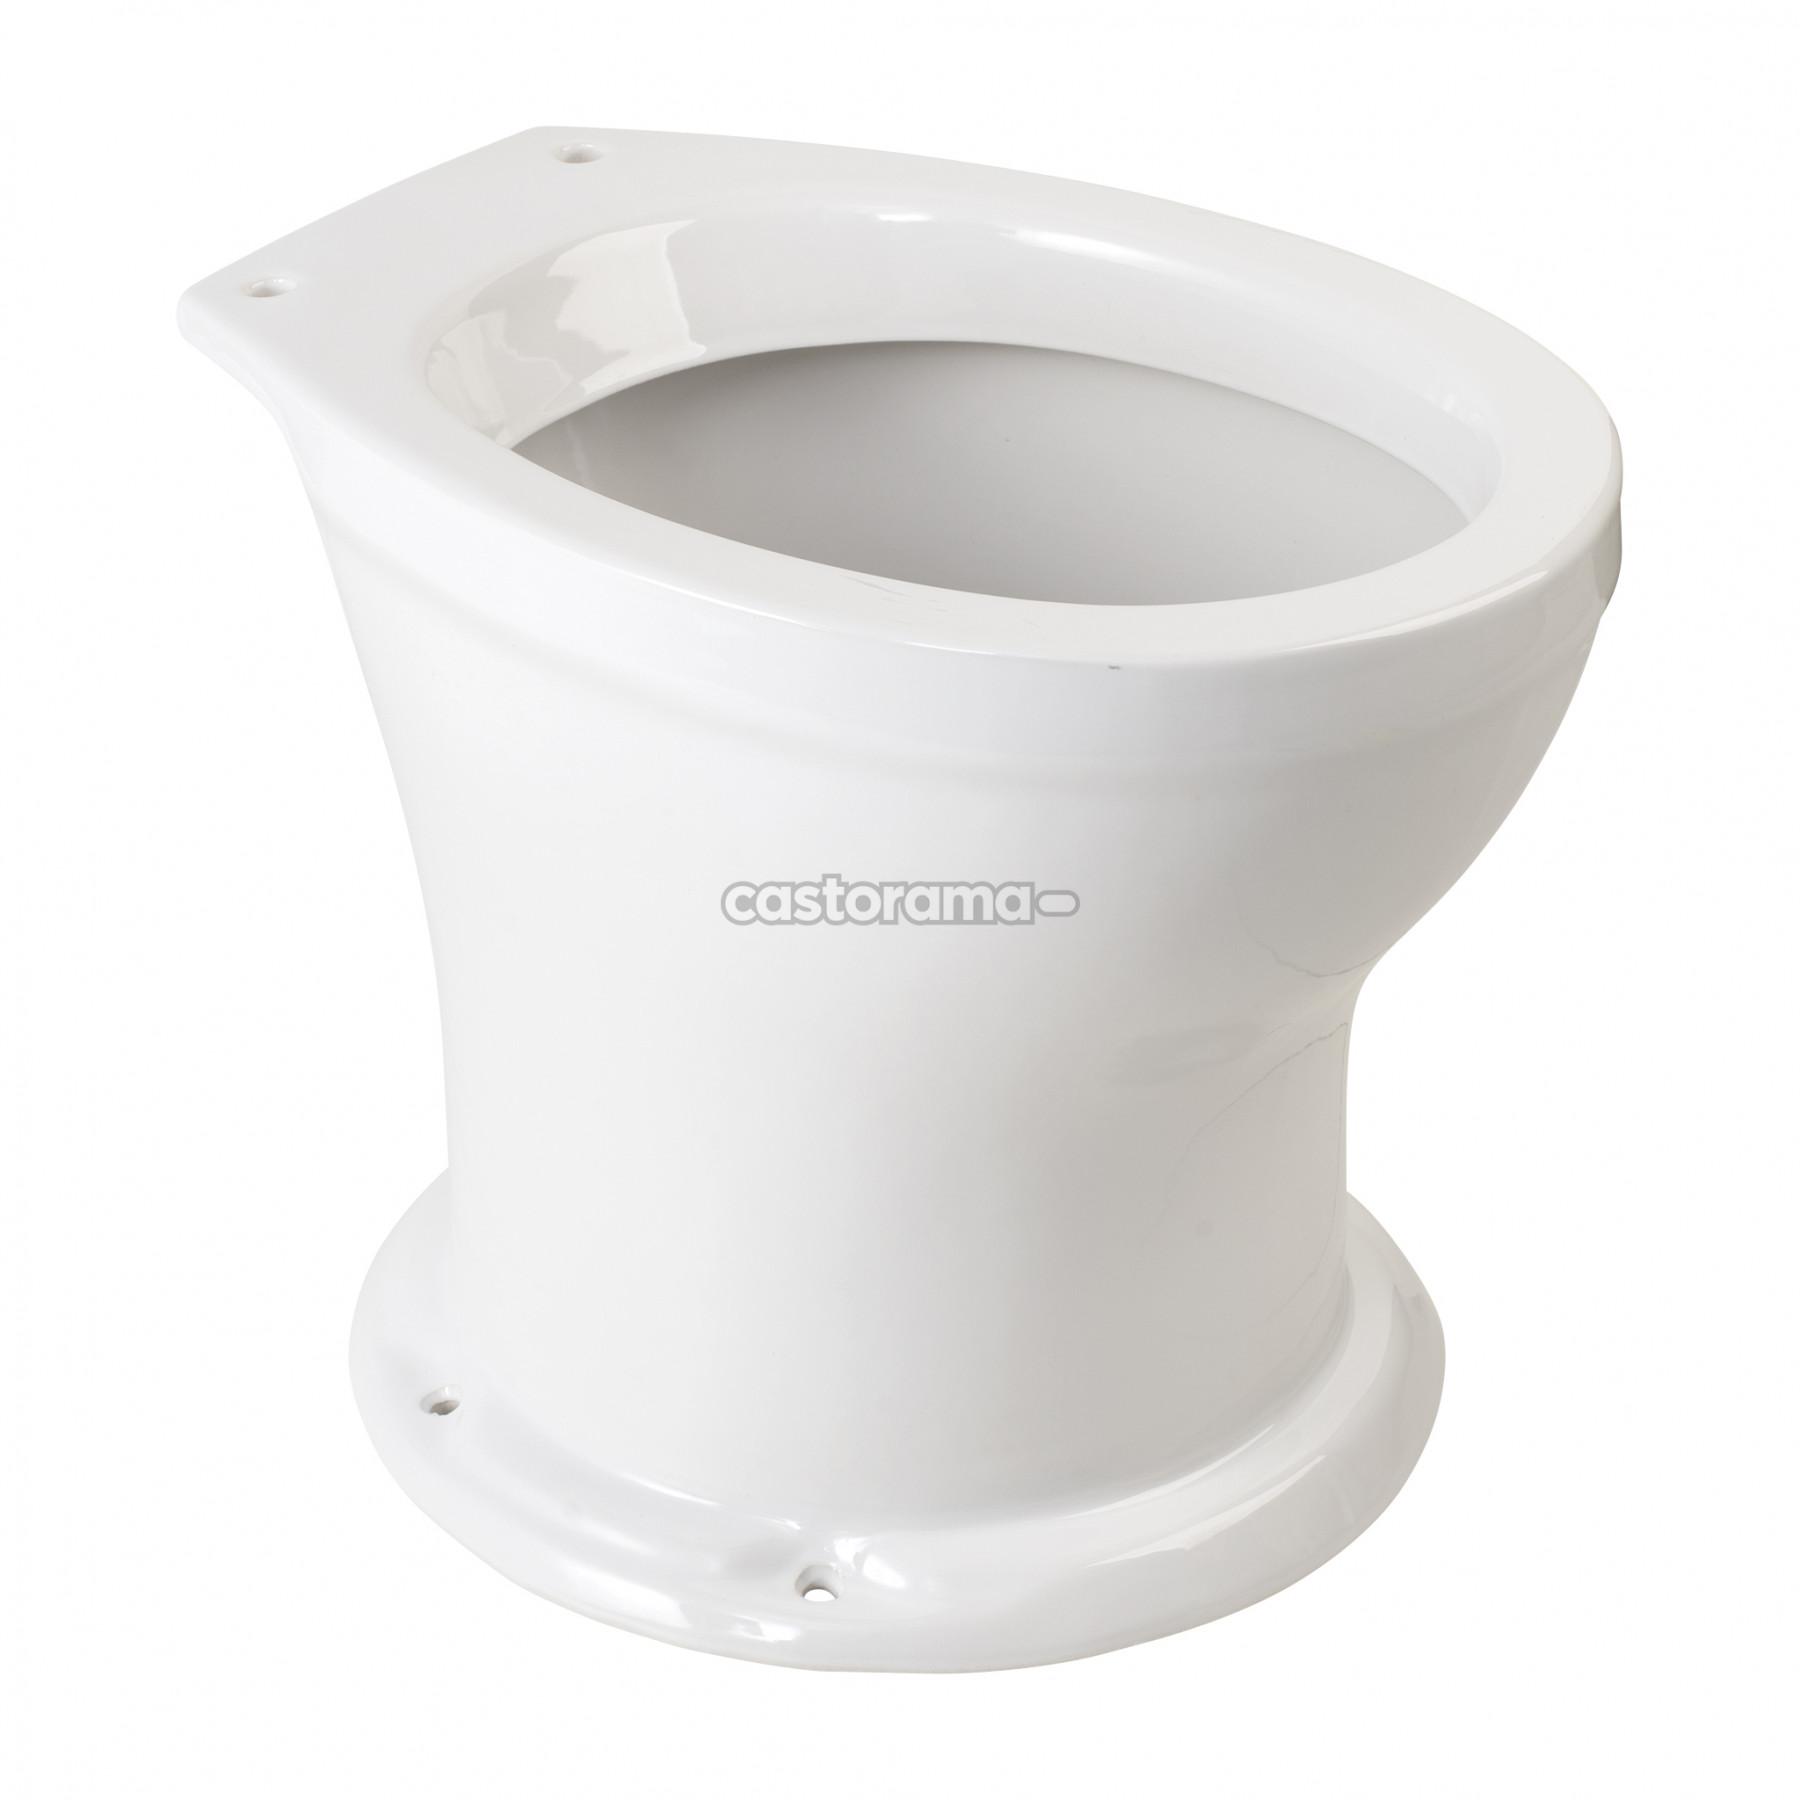 Пластиковый туалет на дачу